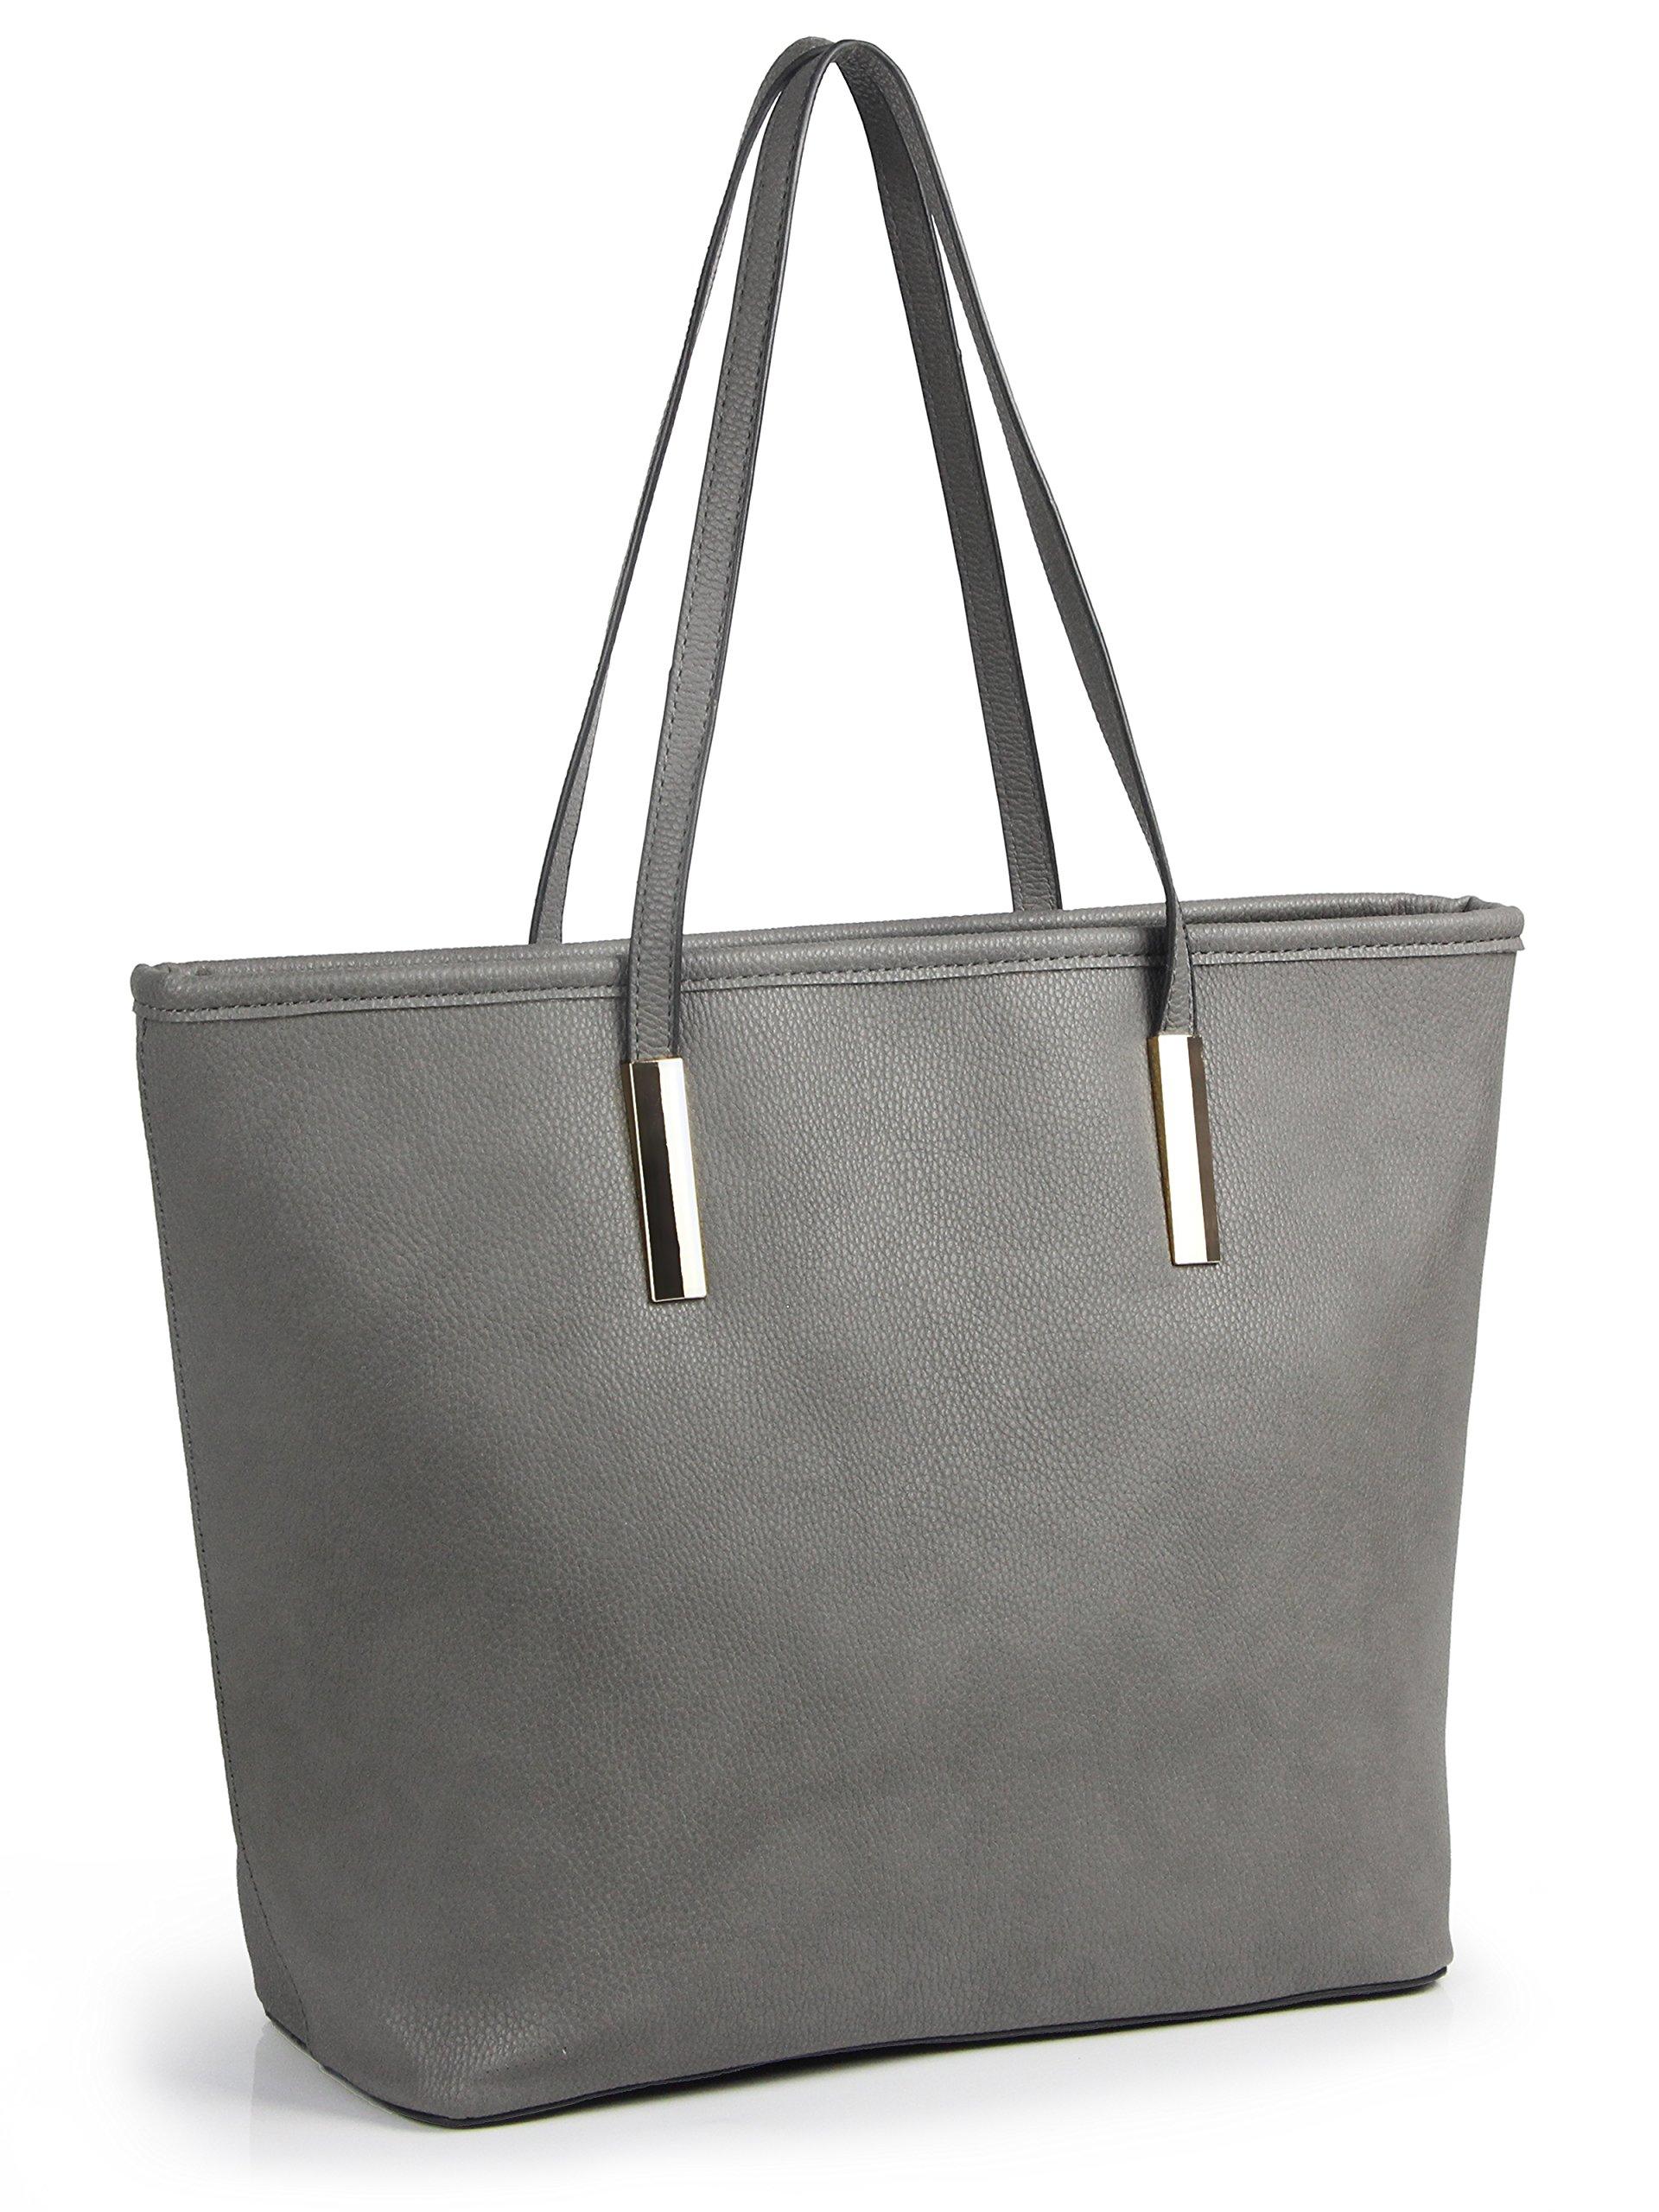 Simple Solid Color Pu Leather Top Handle Satchel Handbags for Women Shoulder Bags (Grey)